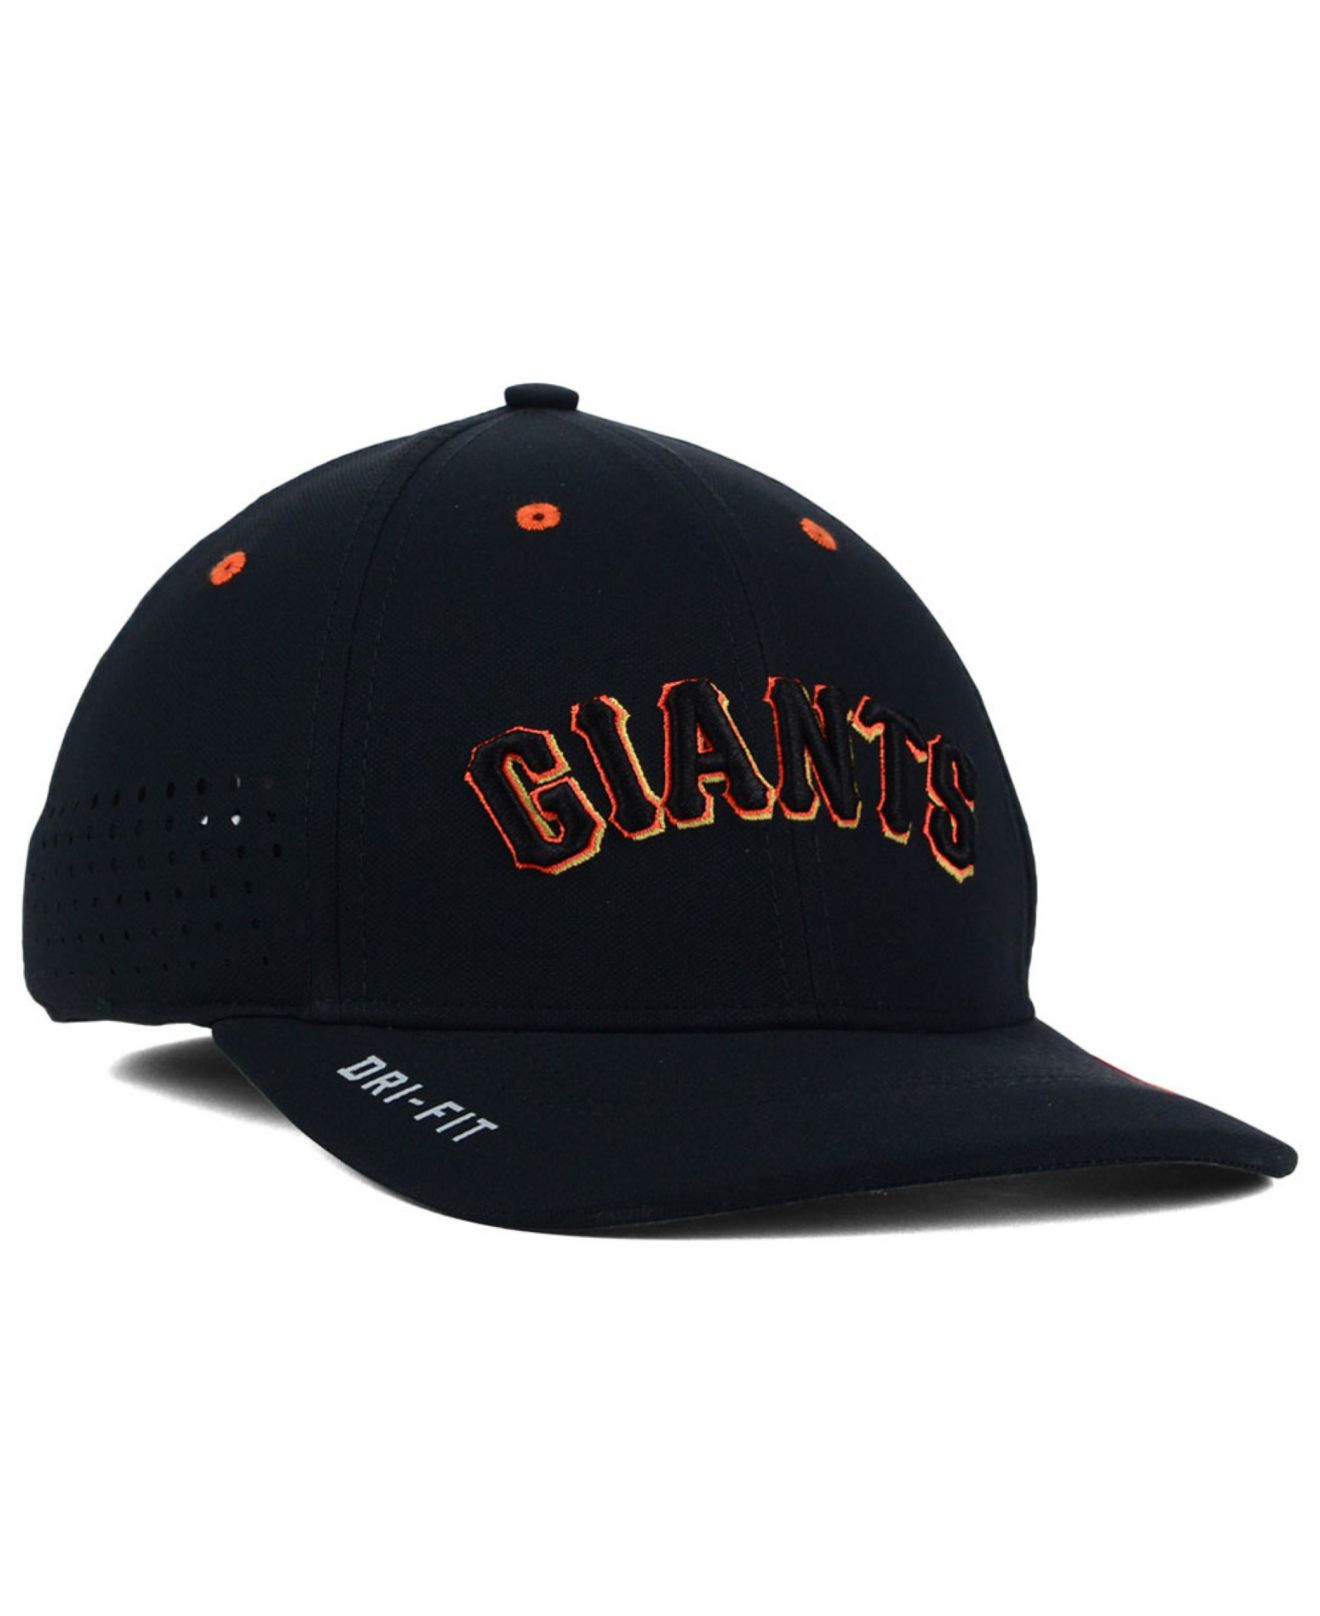 Lyst - Nike San Francisco Giants Vapor Swoosh Flex Cap in Black for Men a3c88974e24